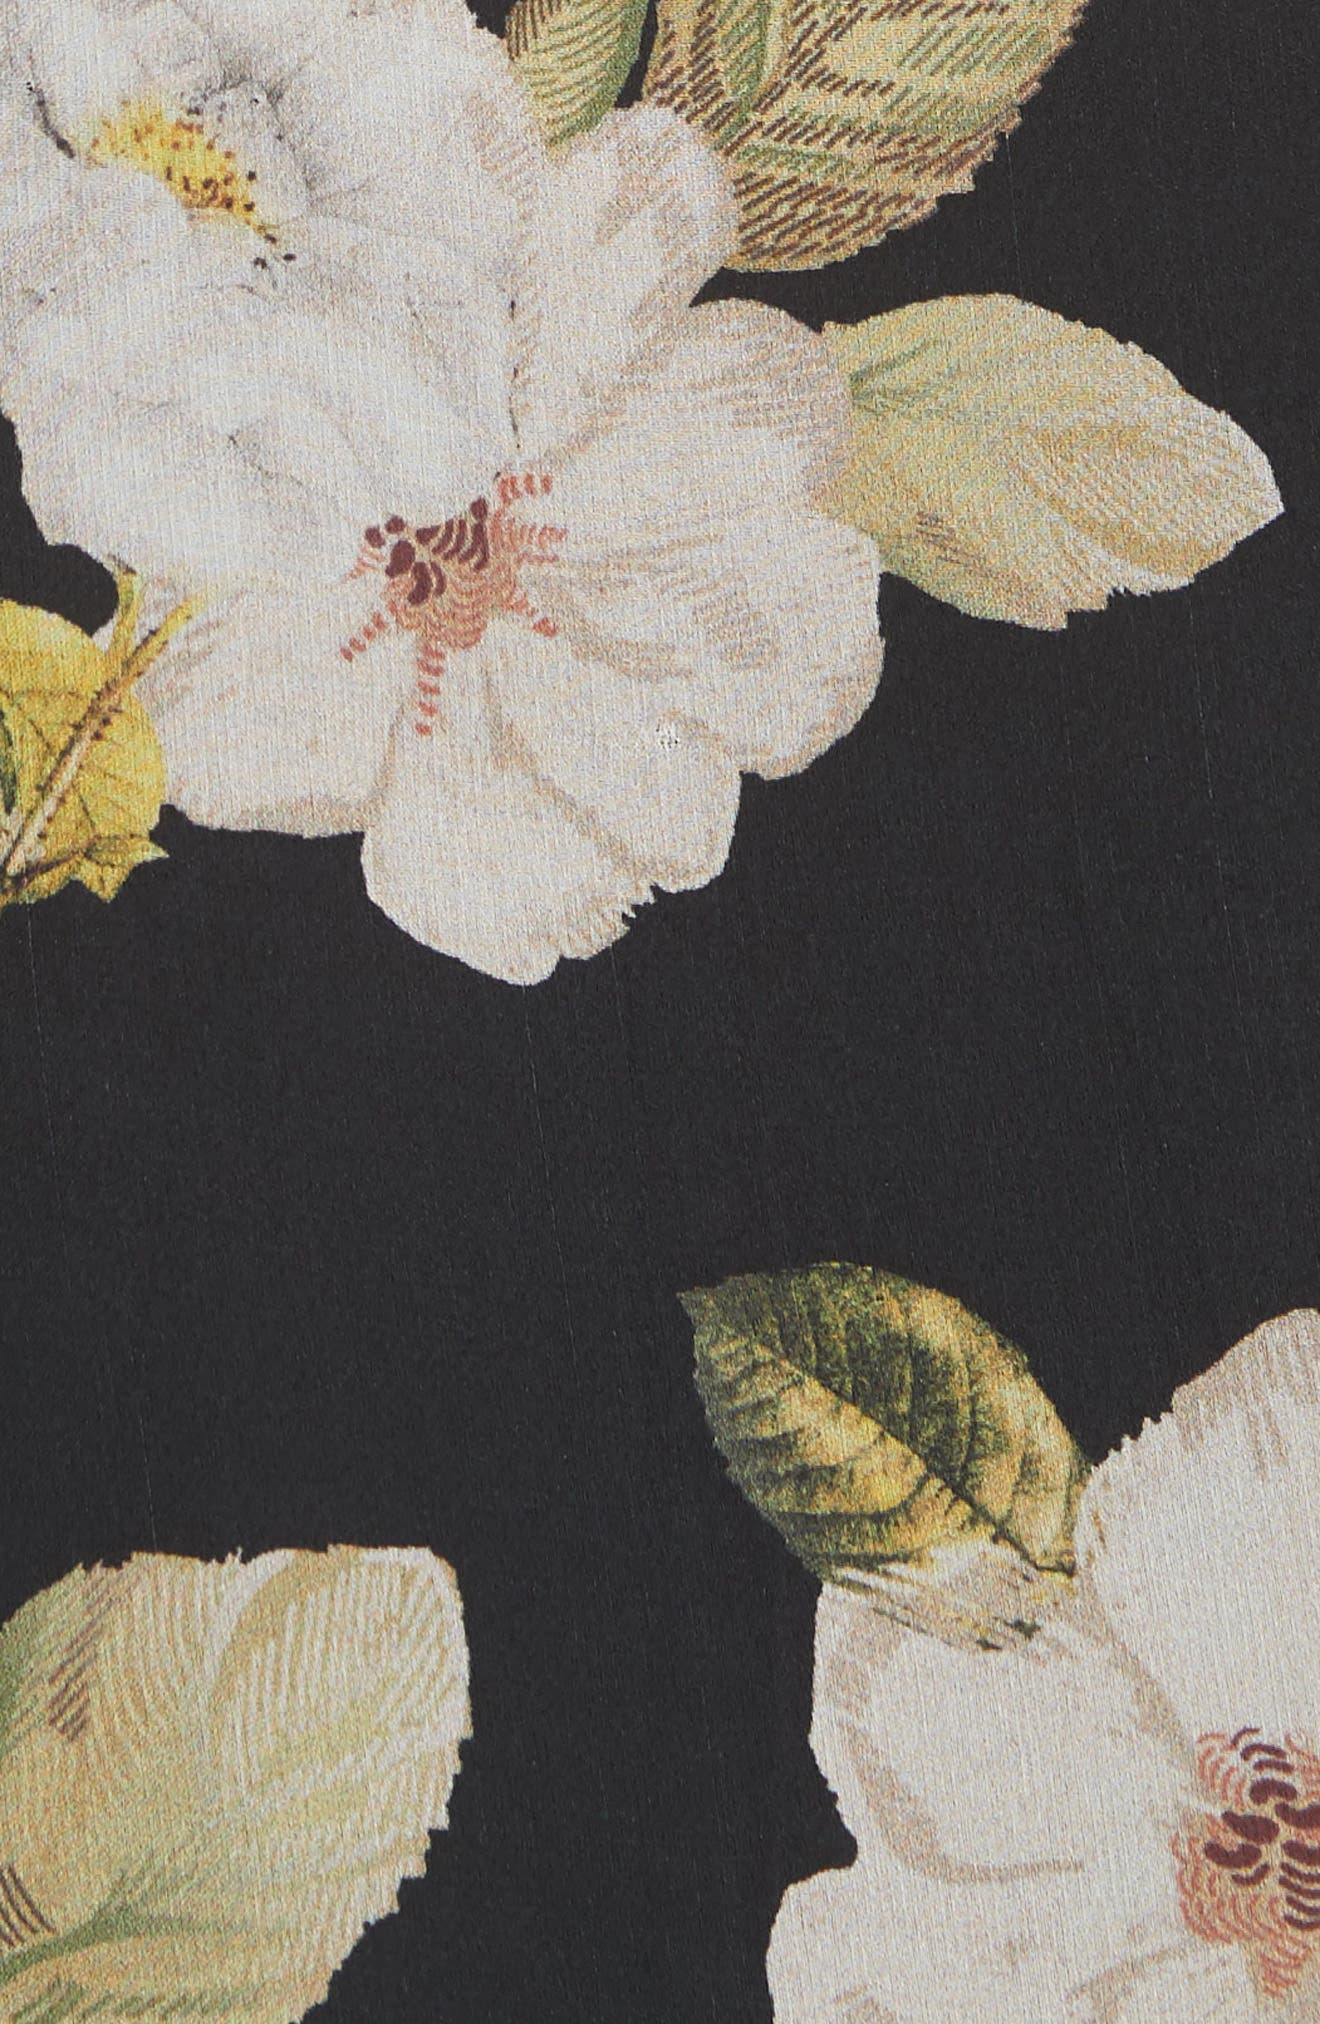 Julius Sheer Silk Tunic Blouse,                             Alternate thumbnail 3, color,                             Hazy Floral Black